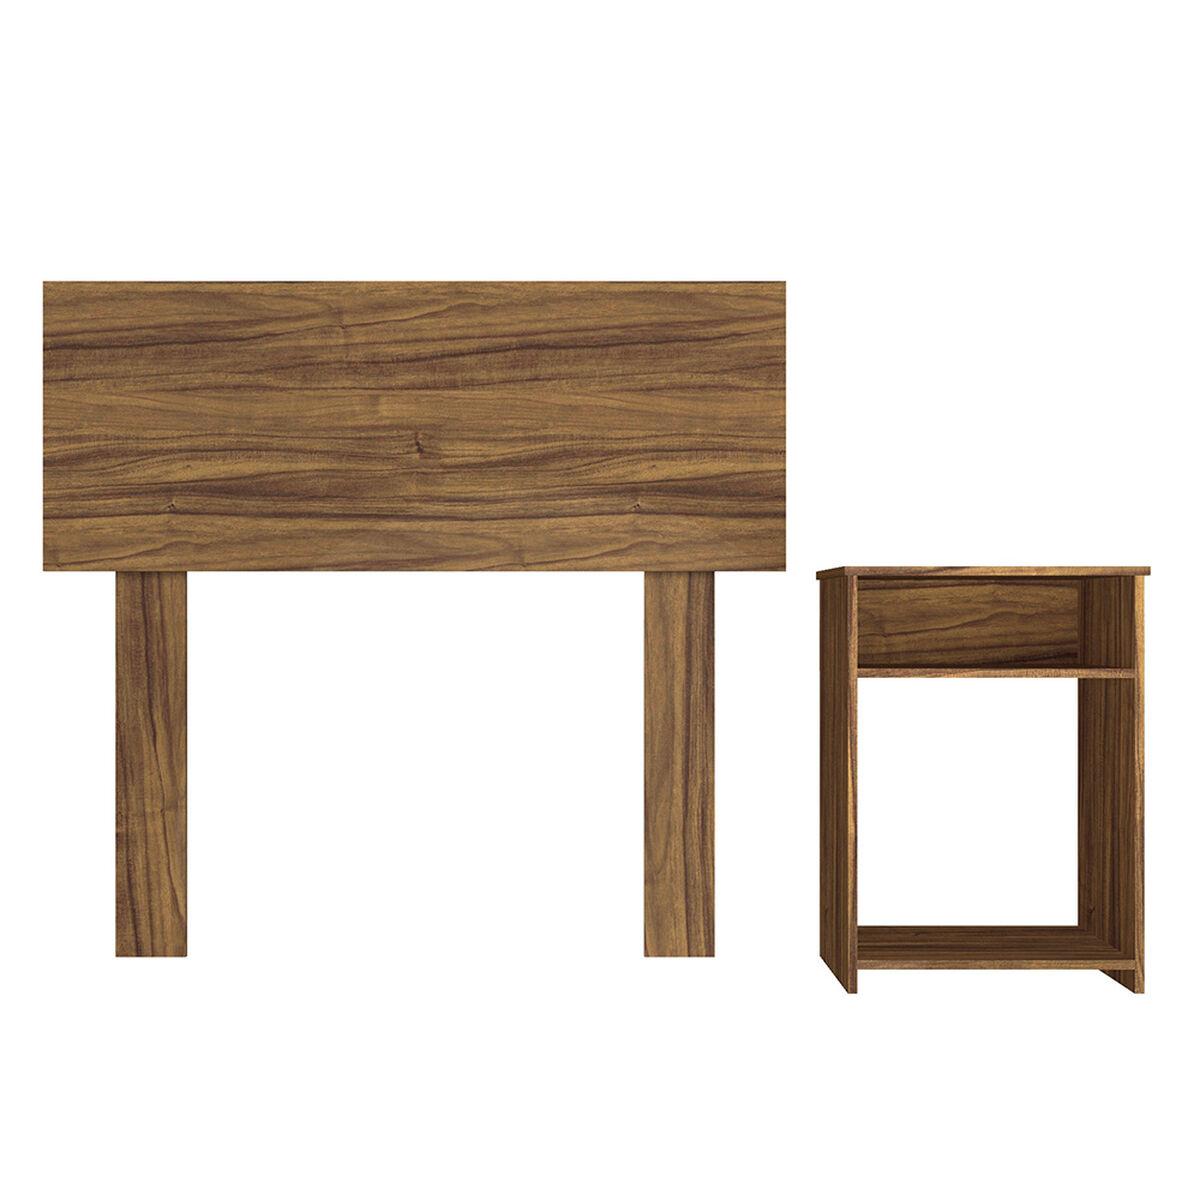 Combo Box Americano CIC 1,5 Plazas Excellence + Set Maderas Casanova Nogal + Almohada Celta Imperial Soft